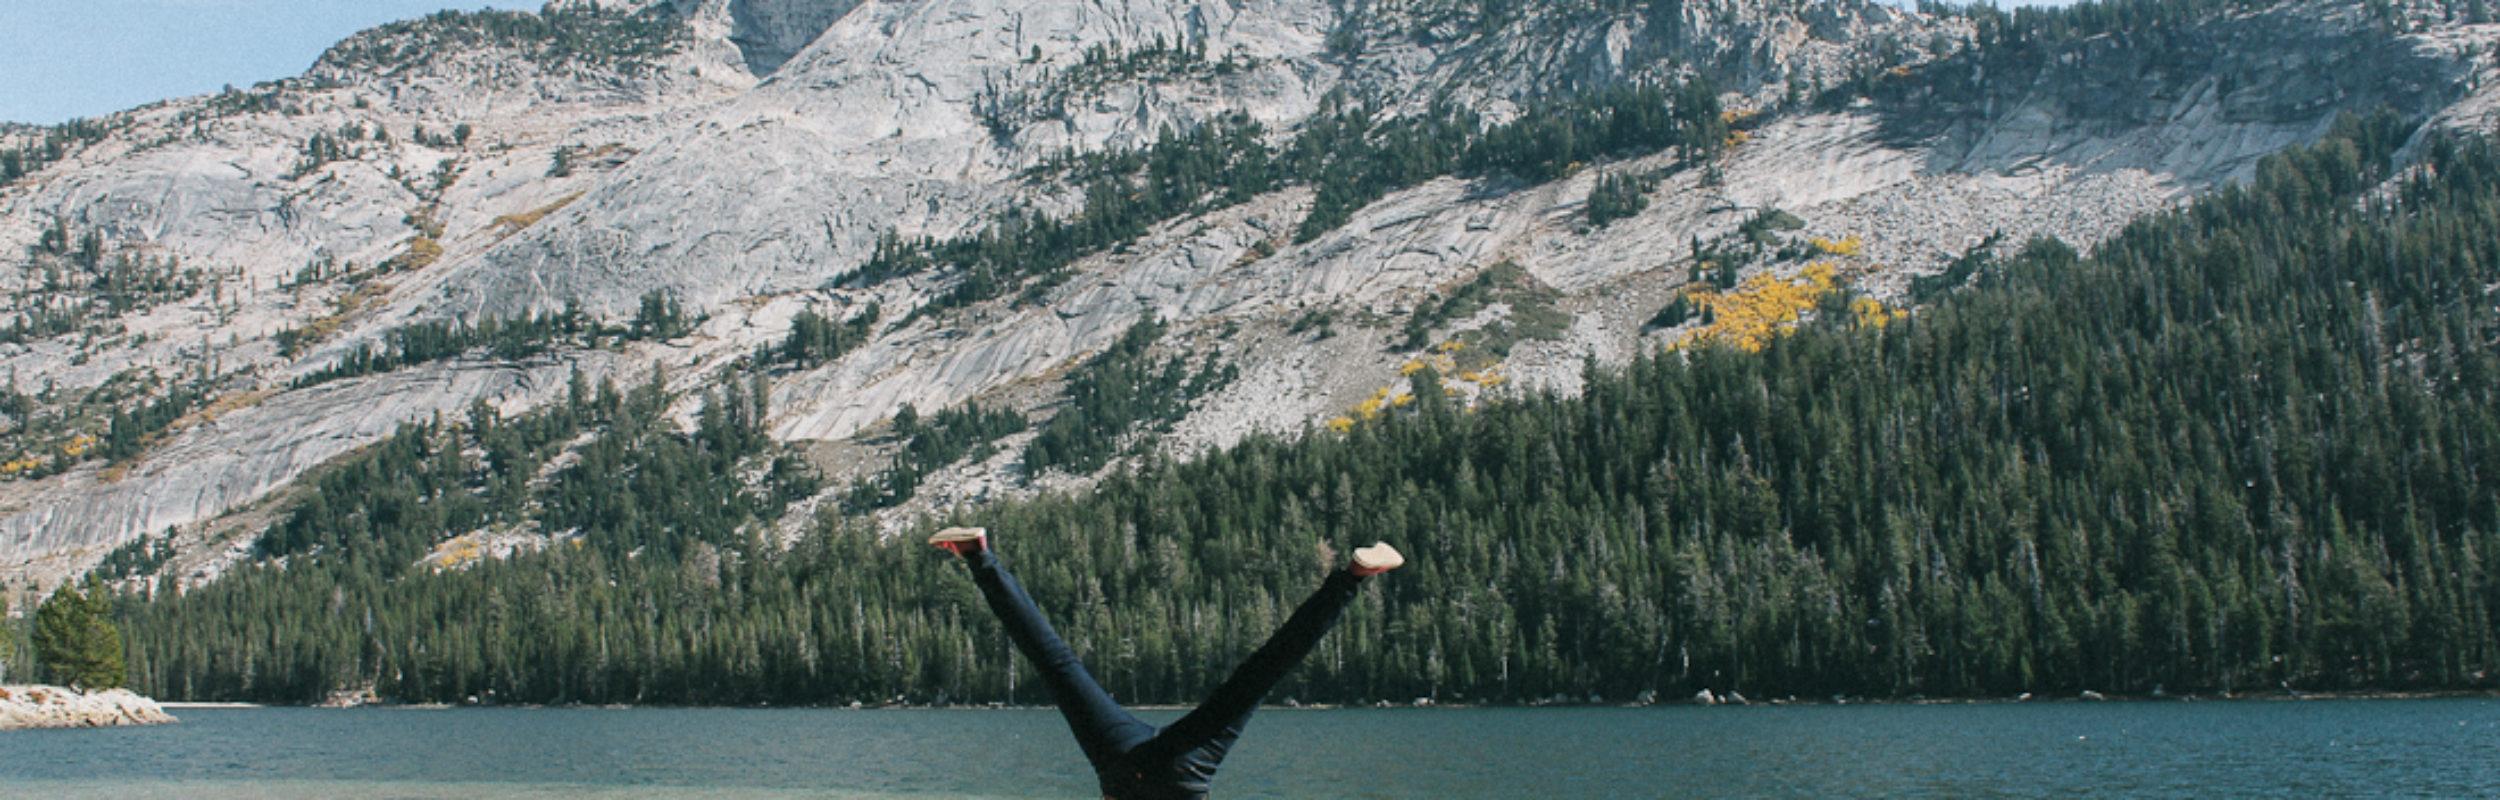 Road-trip en camping-car en Californie : la splendeur de Yosemite National Park